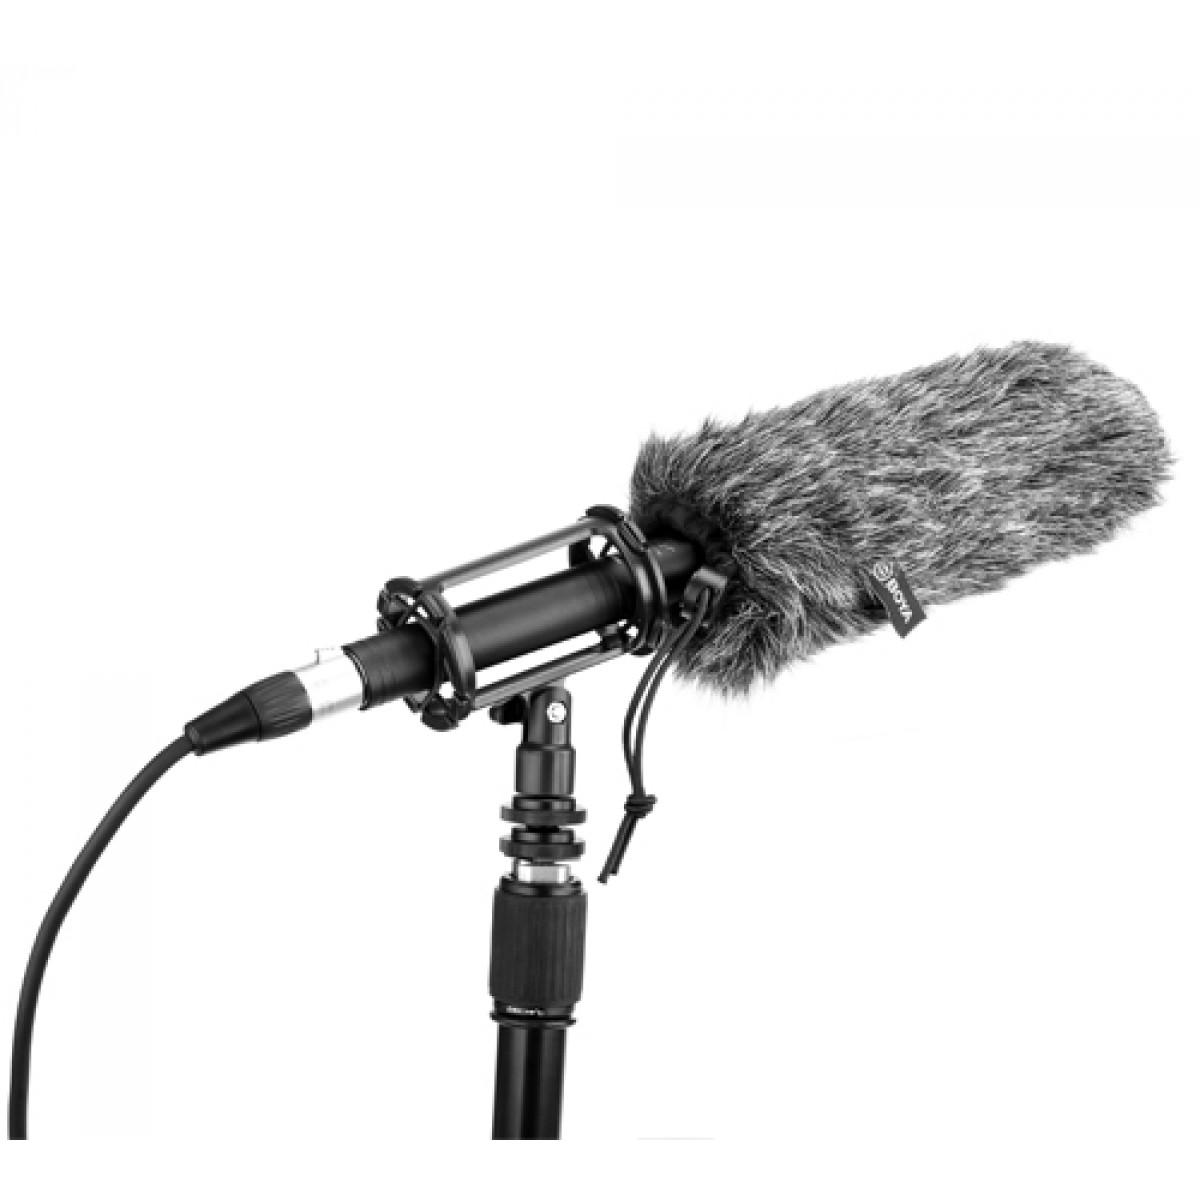 Microfone BOYA BY-BM6060, Cardióide, XLR, Black